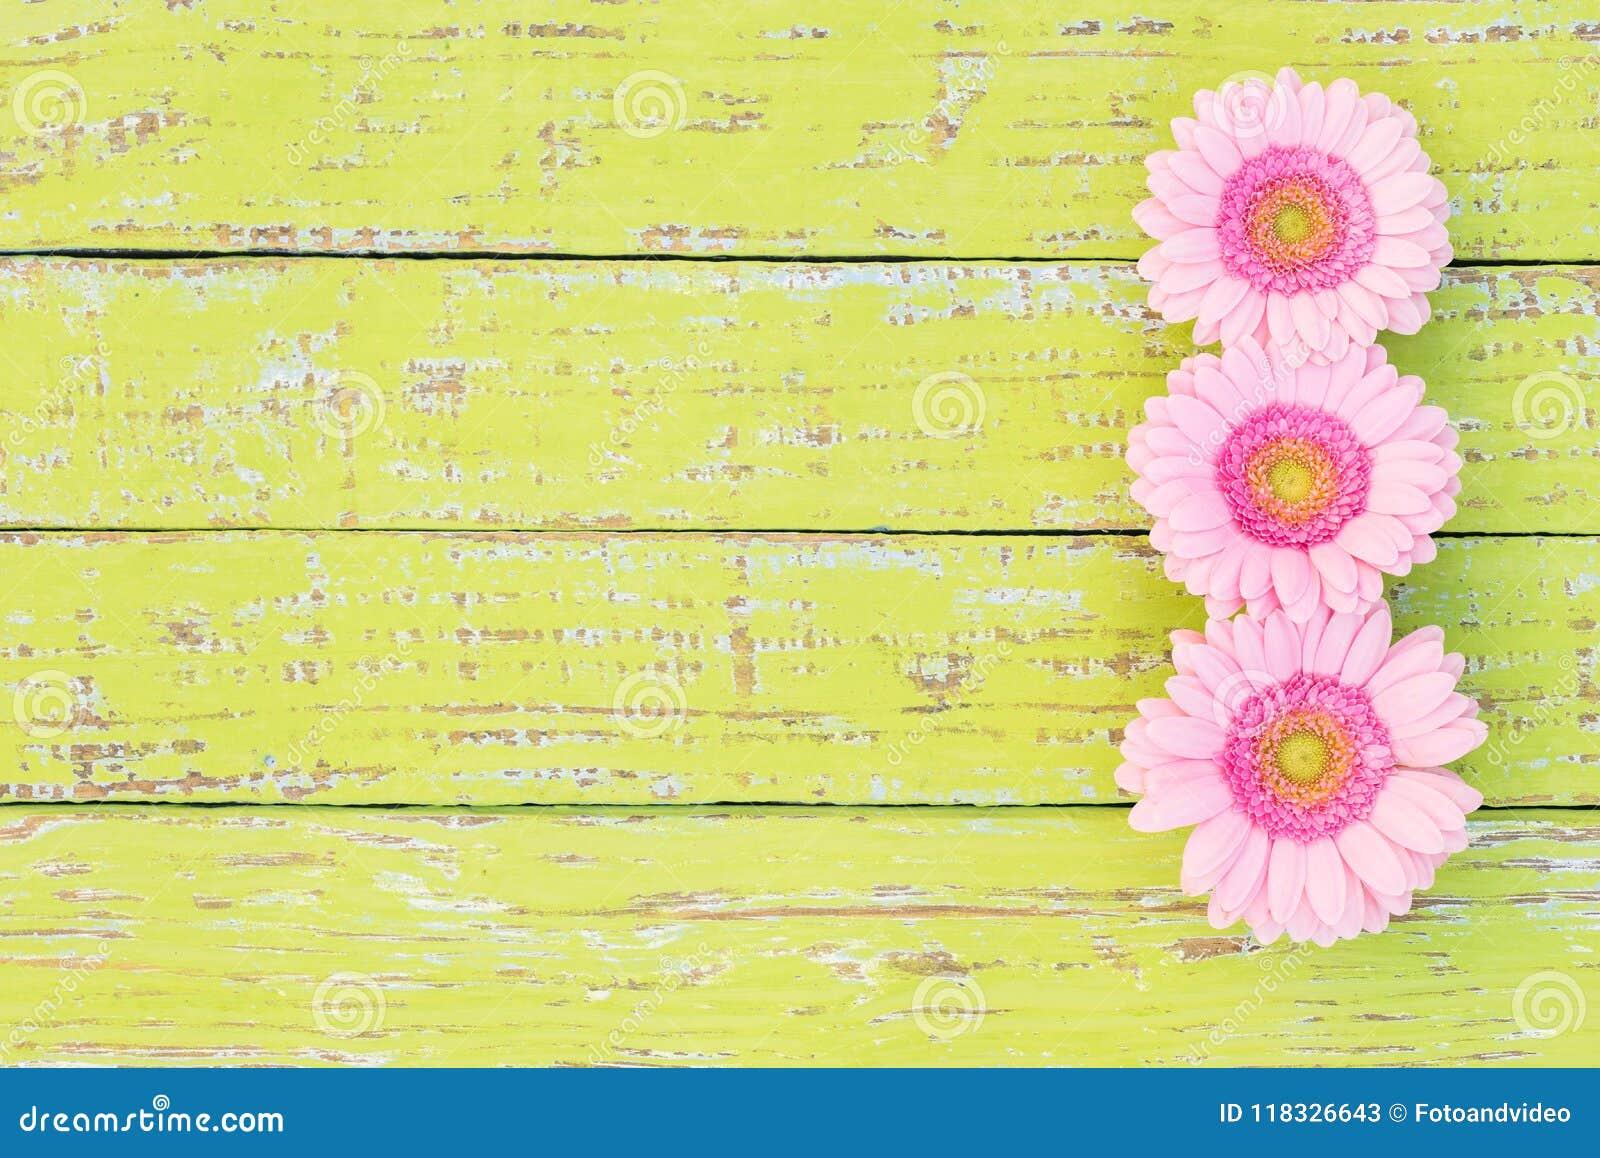 Pink gerbera daisy flower border on rustic wooden background for pink gerbera daisy flower border on rustic wooden background for greeting card izmirmasajfo